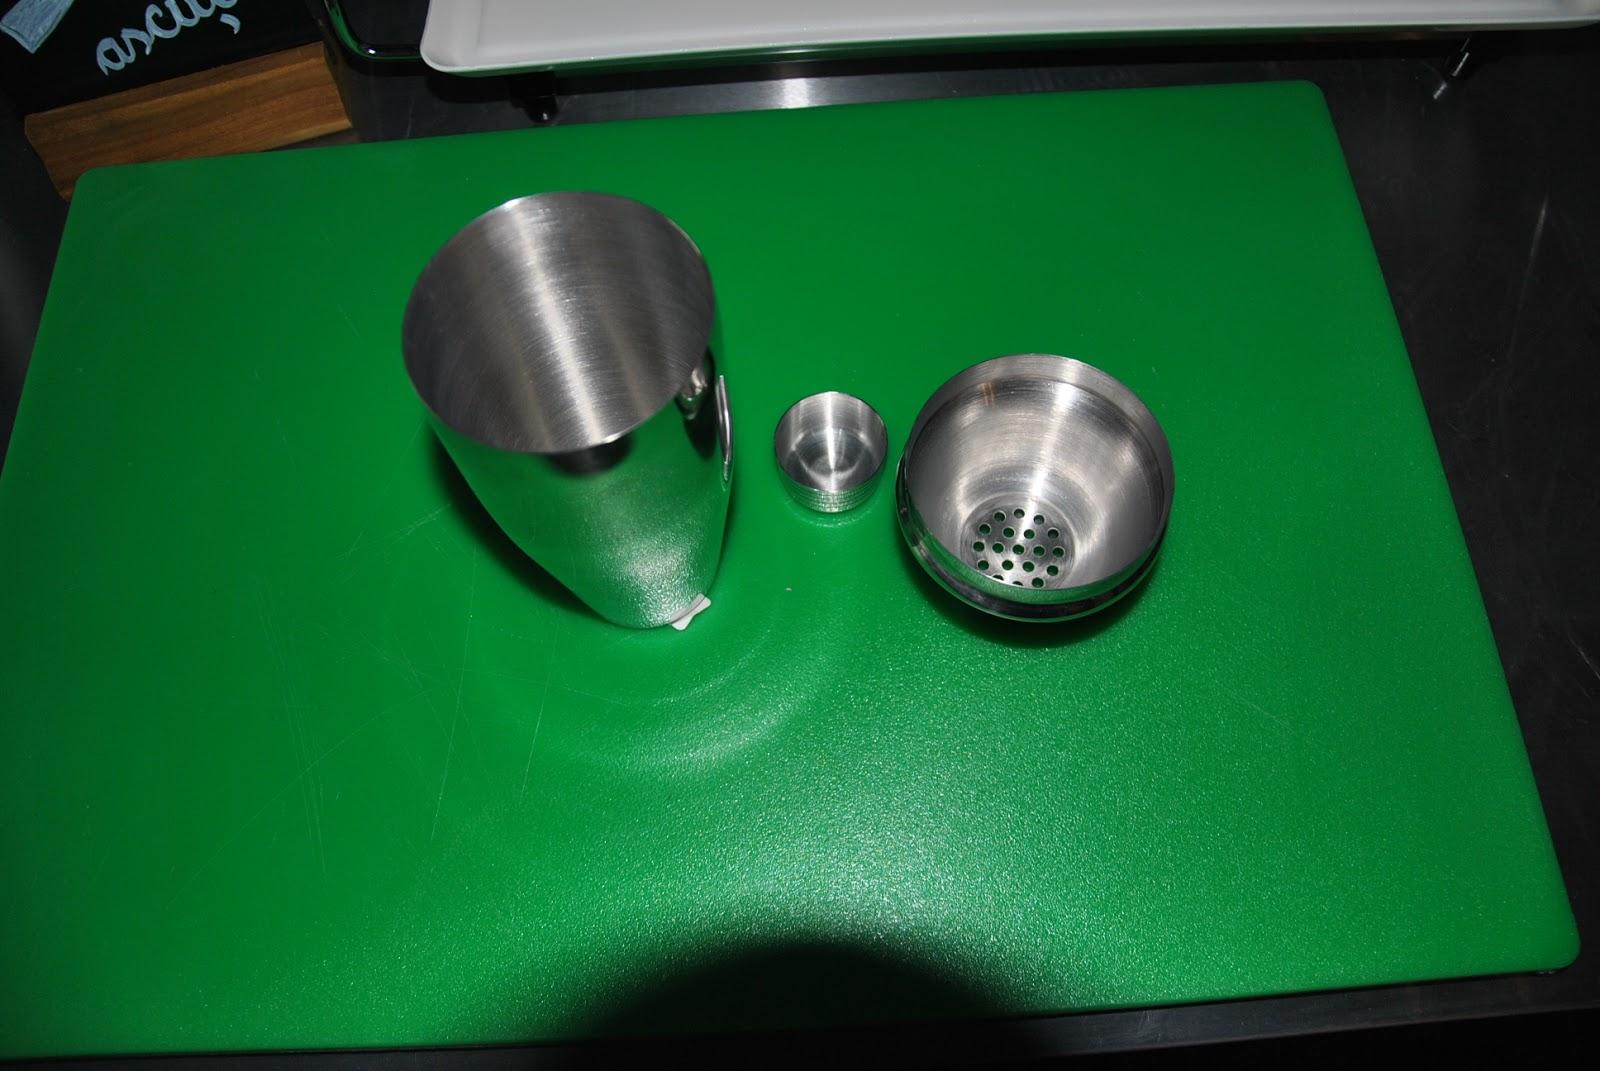 Shaker pentru cocktail, realizat din otel inoxidabil, 3 bucati Ø 80x(H)240 mm 0.75 Lit